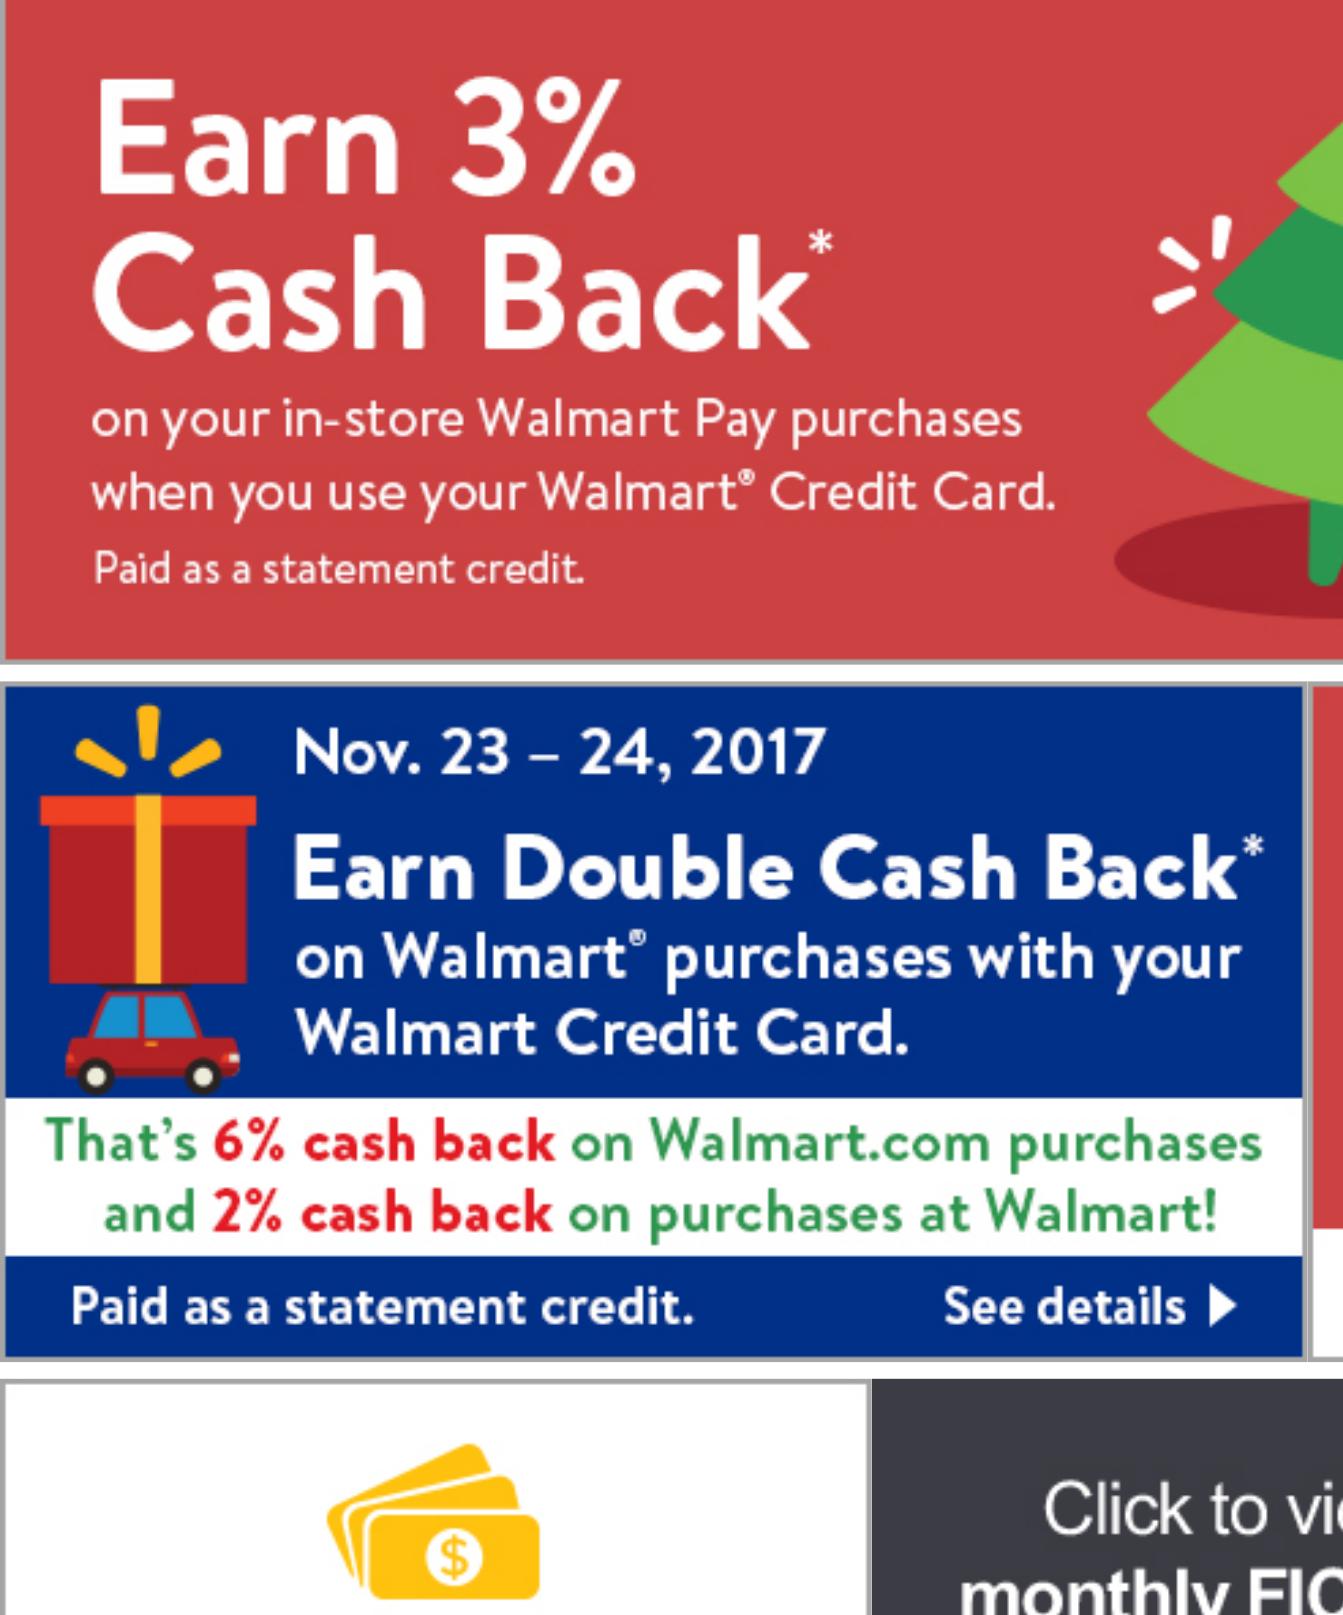 Walmart Mc 6% Cash Back Offer On Walmart.com